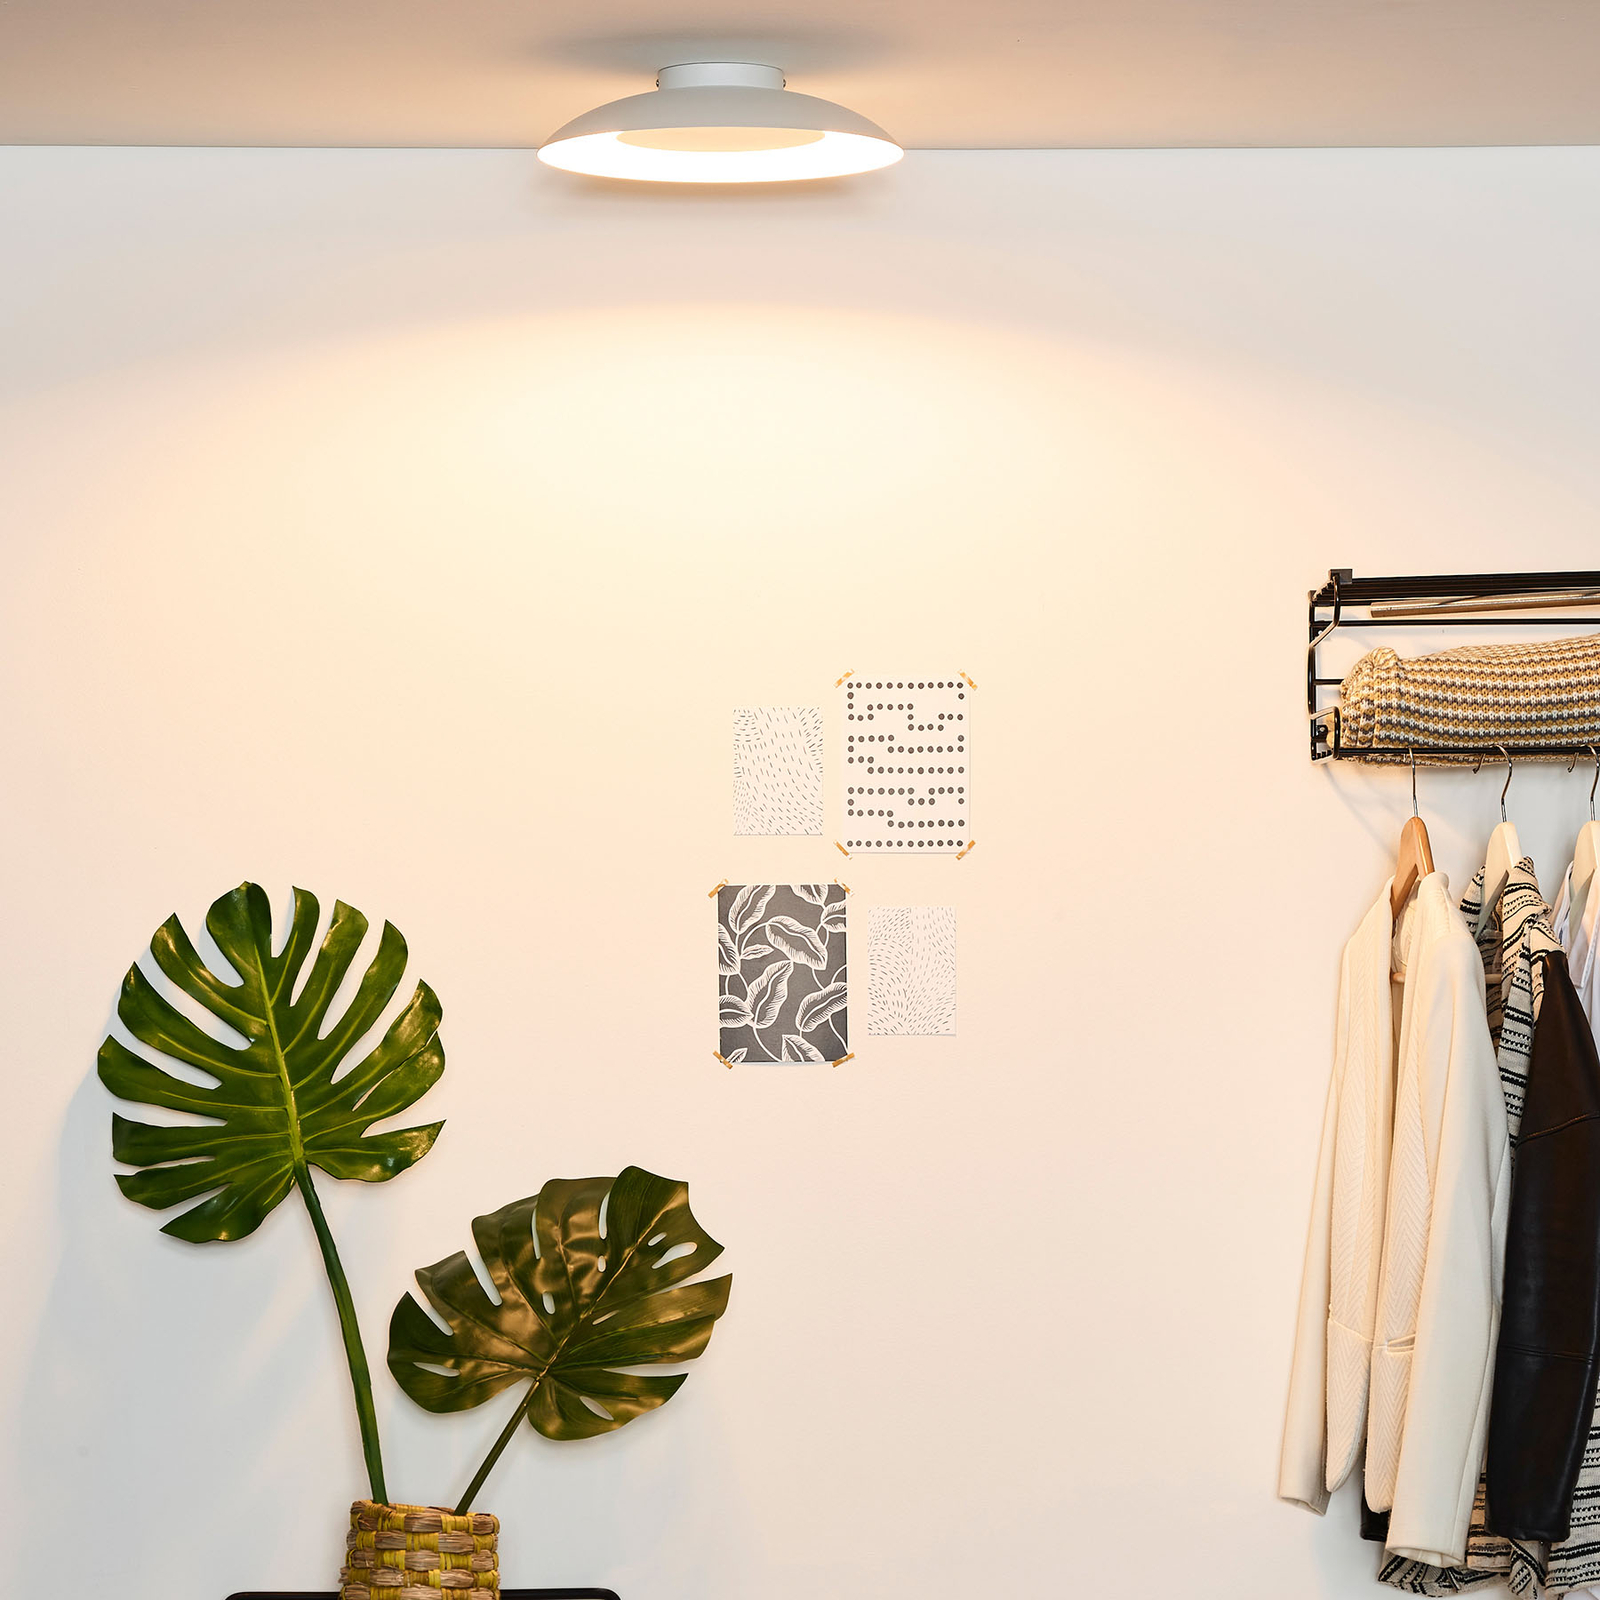 LED-kattovalaisin Foskal, valkoinen, Ø 34,5 cm